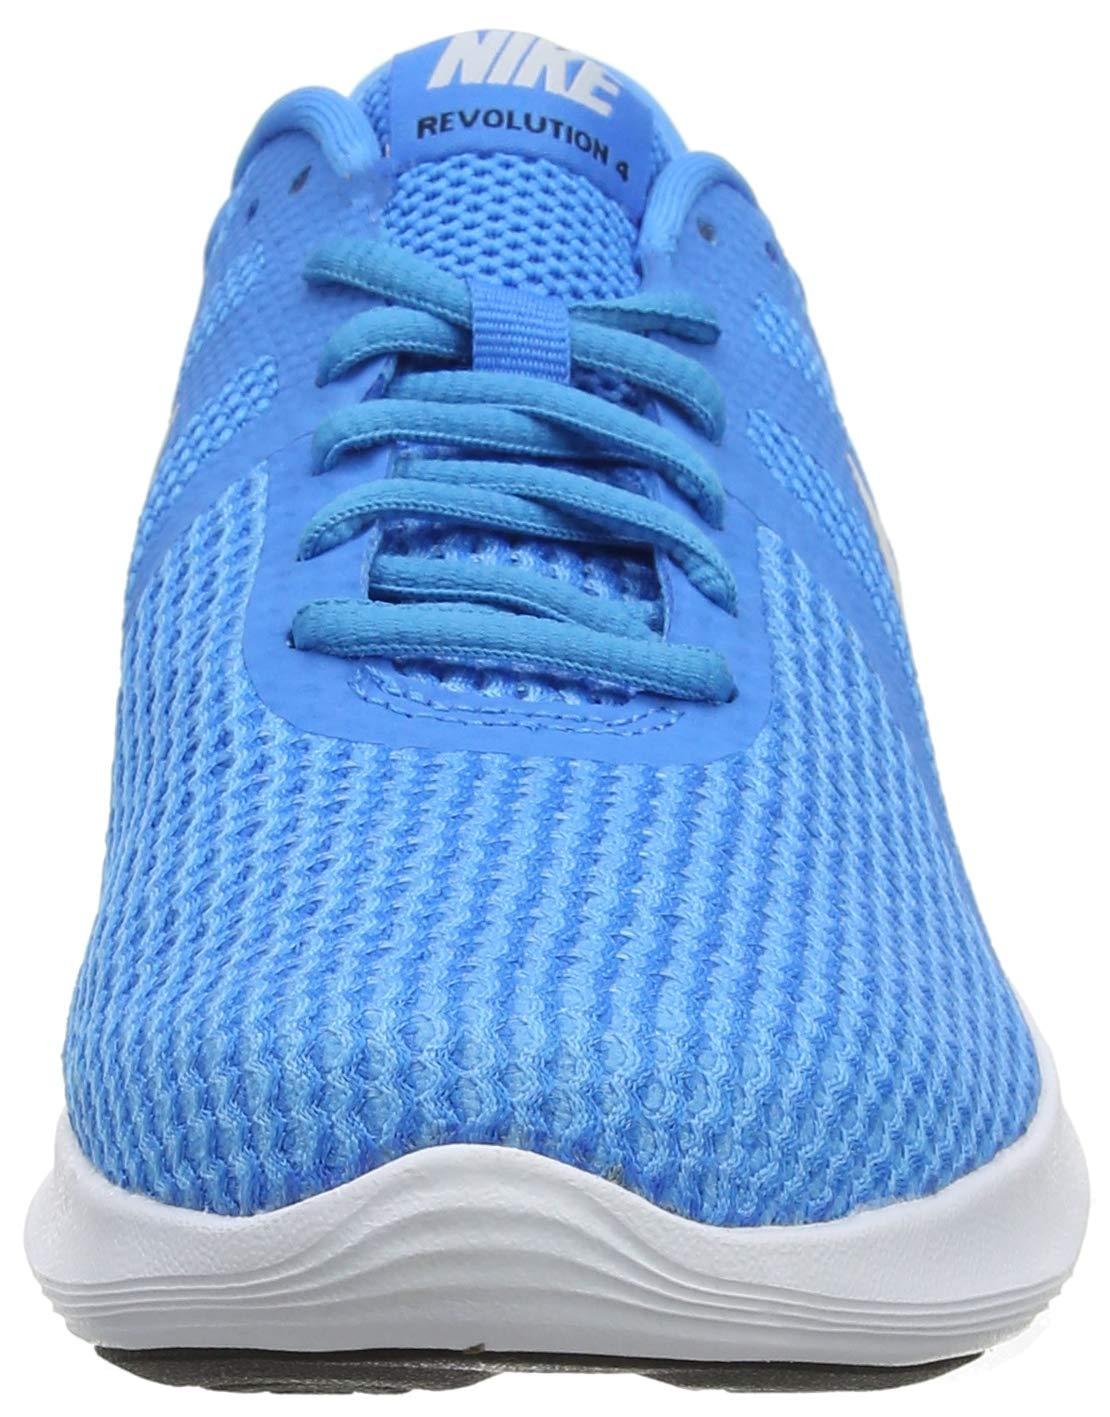 Nike Revolution 4 EU, Zapatillas de Deporte Hombre